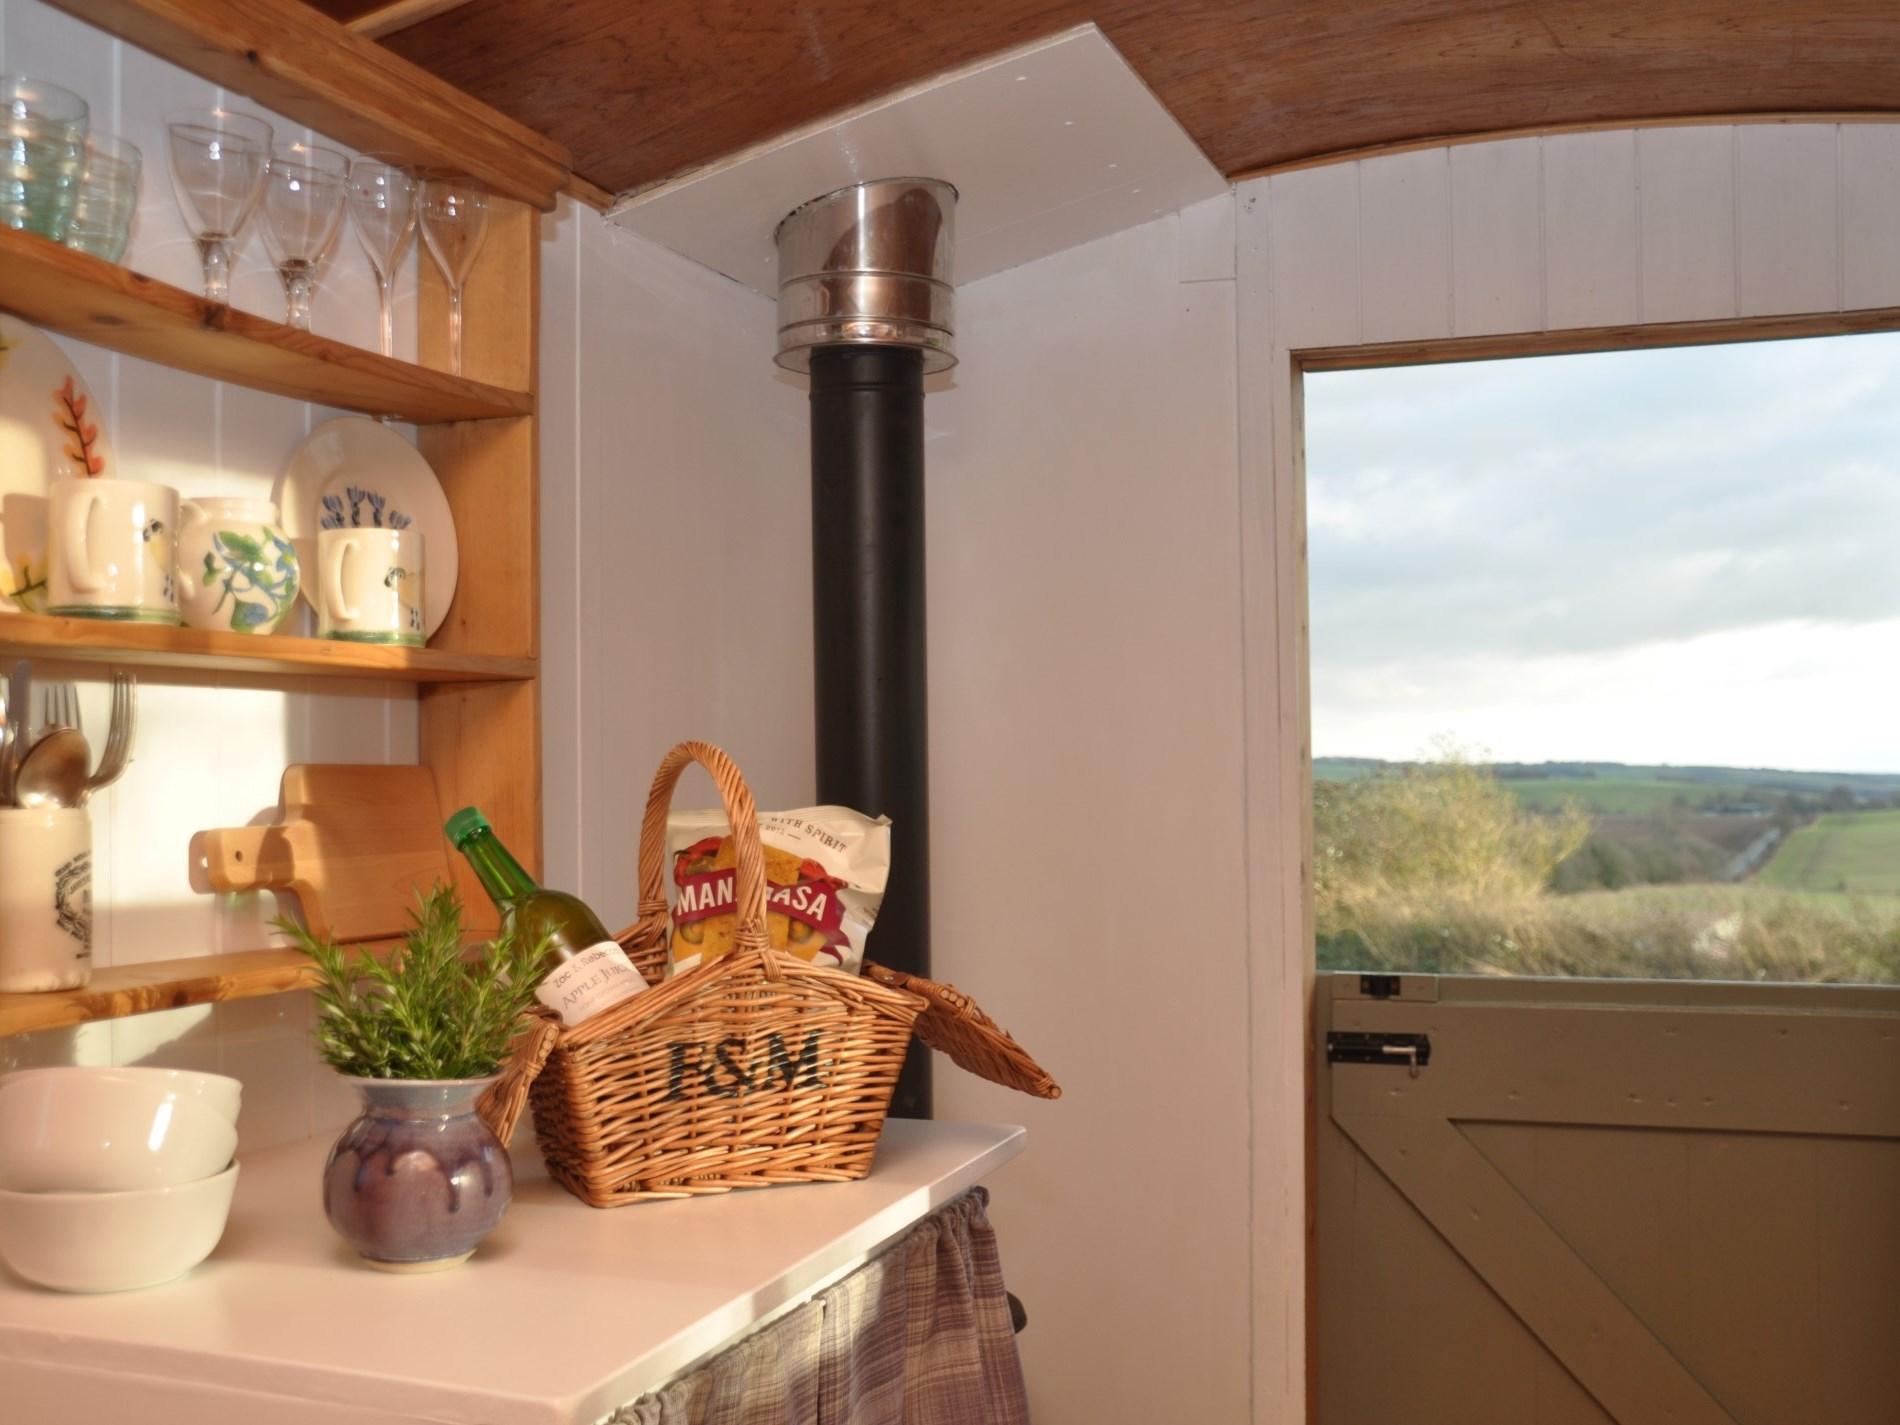 Enjoy the stunning views from the restored shepherd's hut